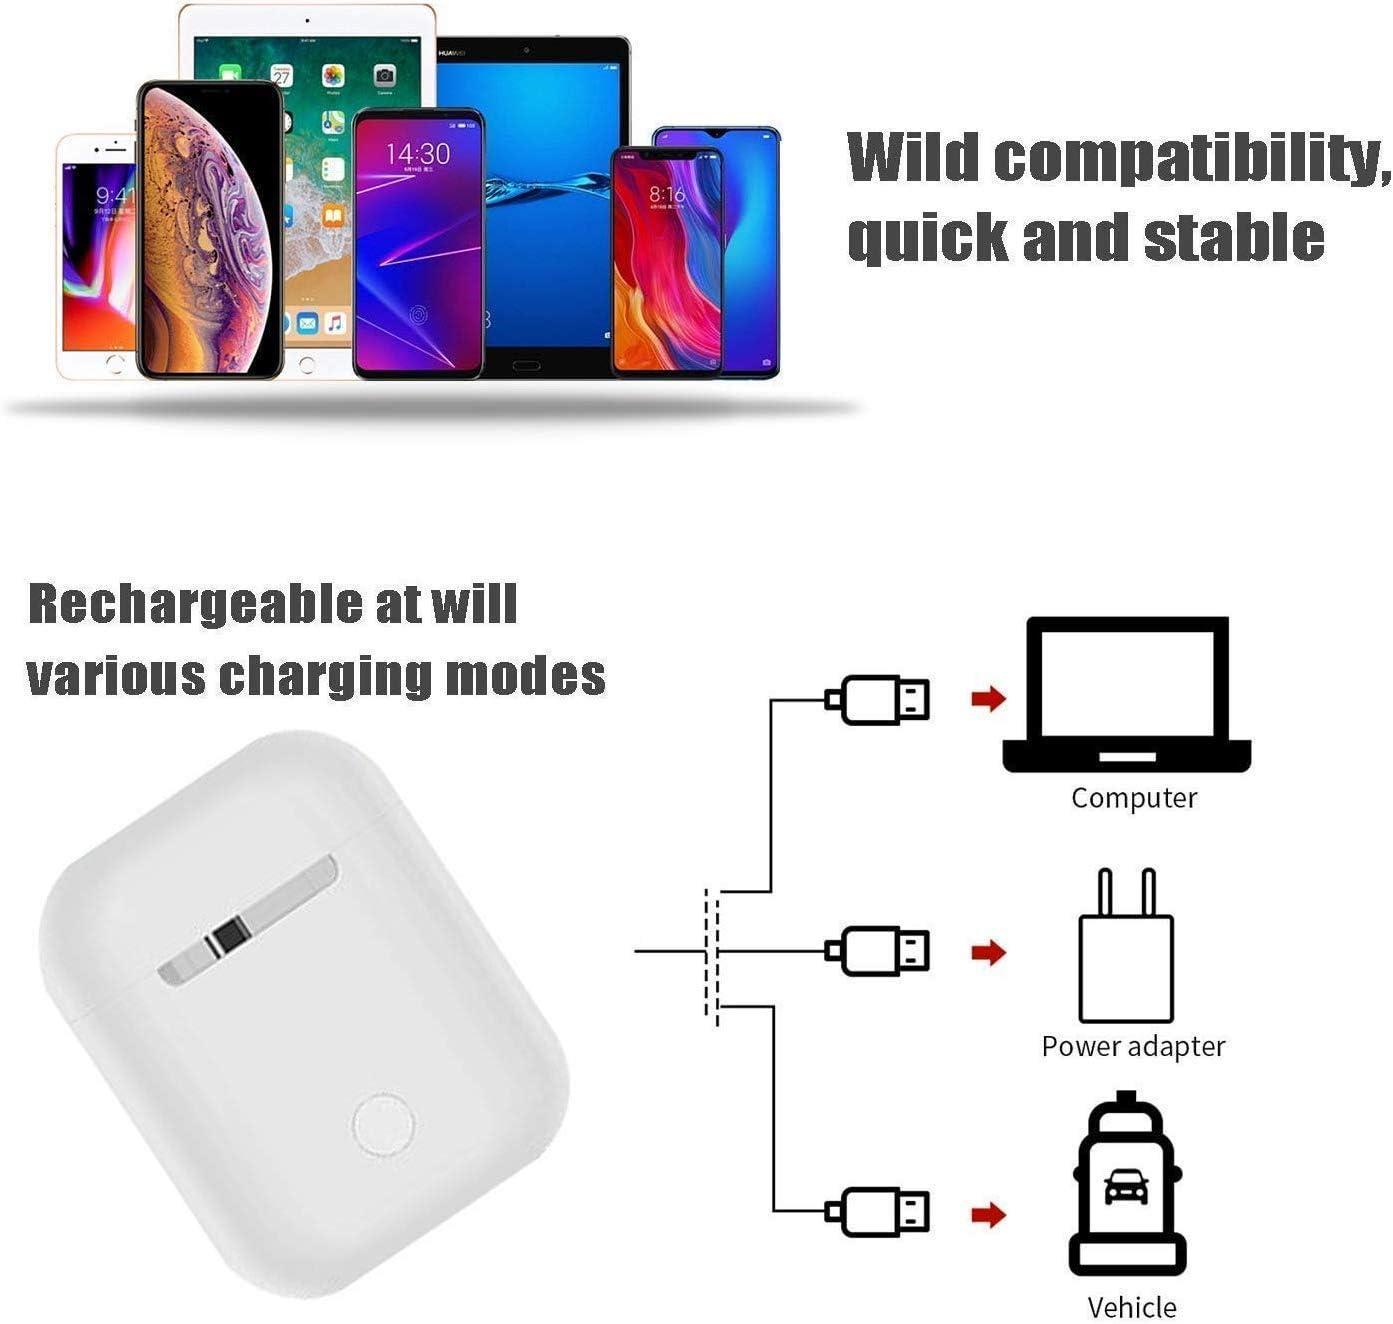 Bluetooth Kopfh/örer 5.0,Stereo-Mini Kabellose Kopfh/örer,Wasserdichtes Sport Bluetooth Kopfh/örer In Ear mit Rauschunterdr/ückung Mikrofon,Kopfh/örer f/ür iPhone Android//Samsung